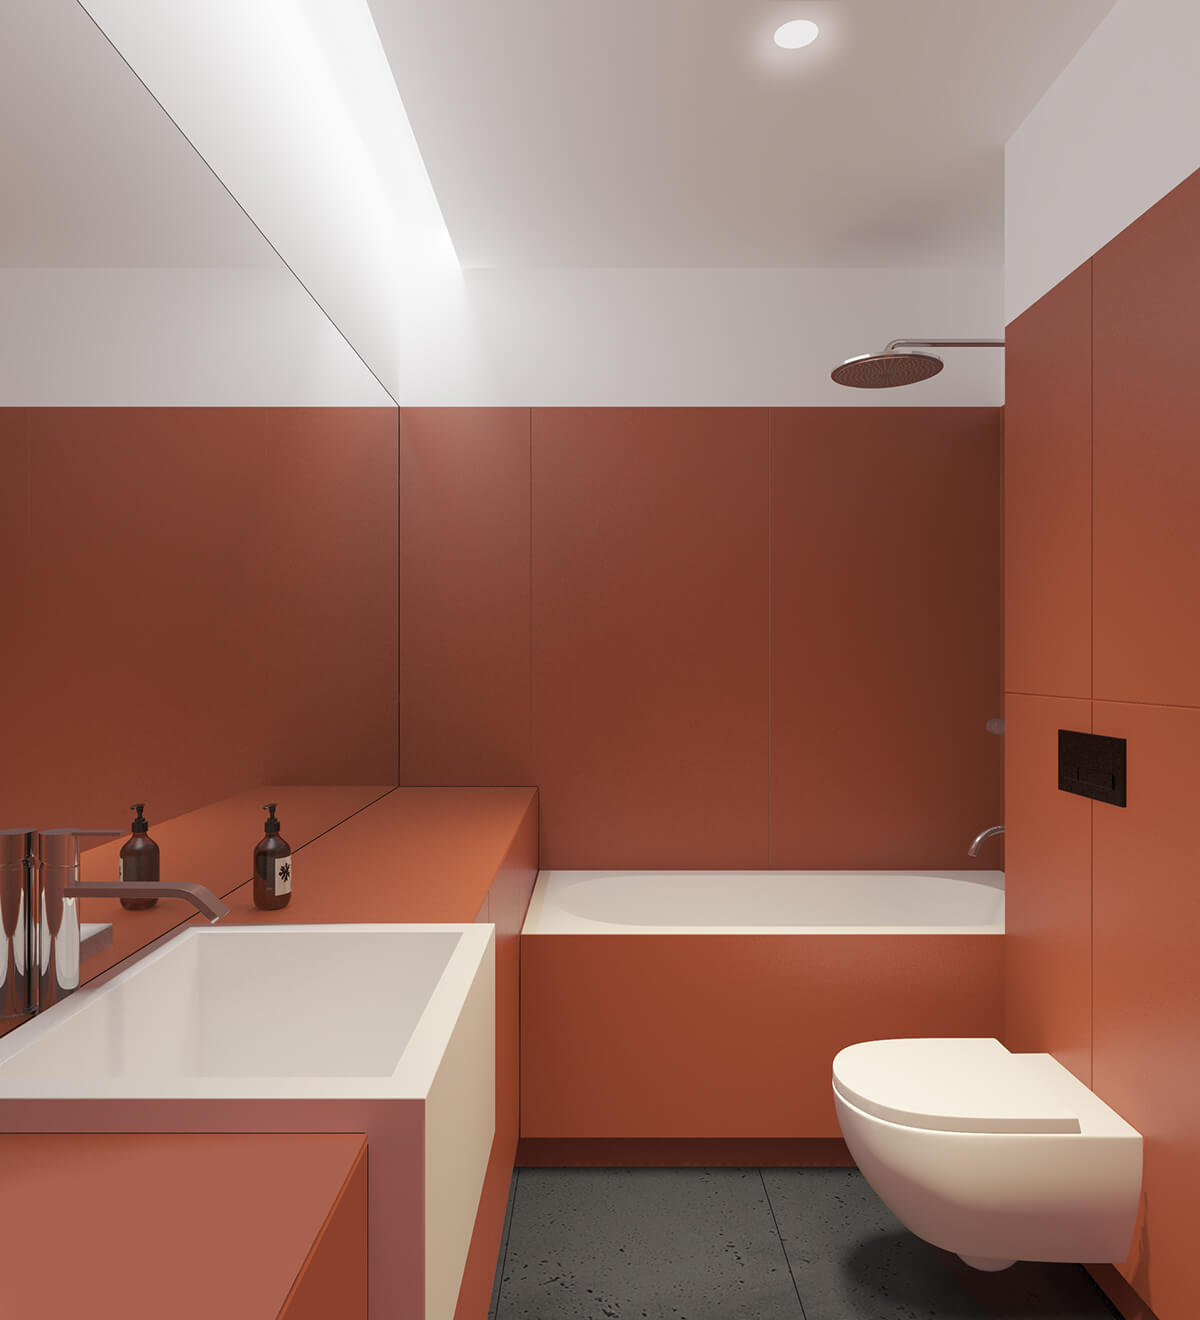 Apartment in Kiev by Emil Dervish and Iya Turabelidze